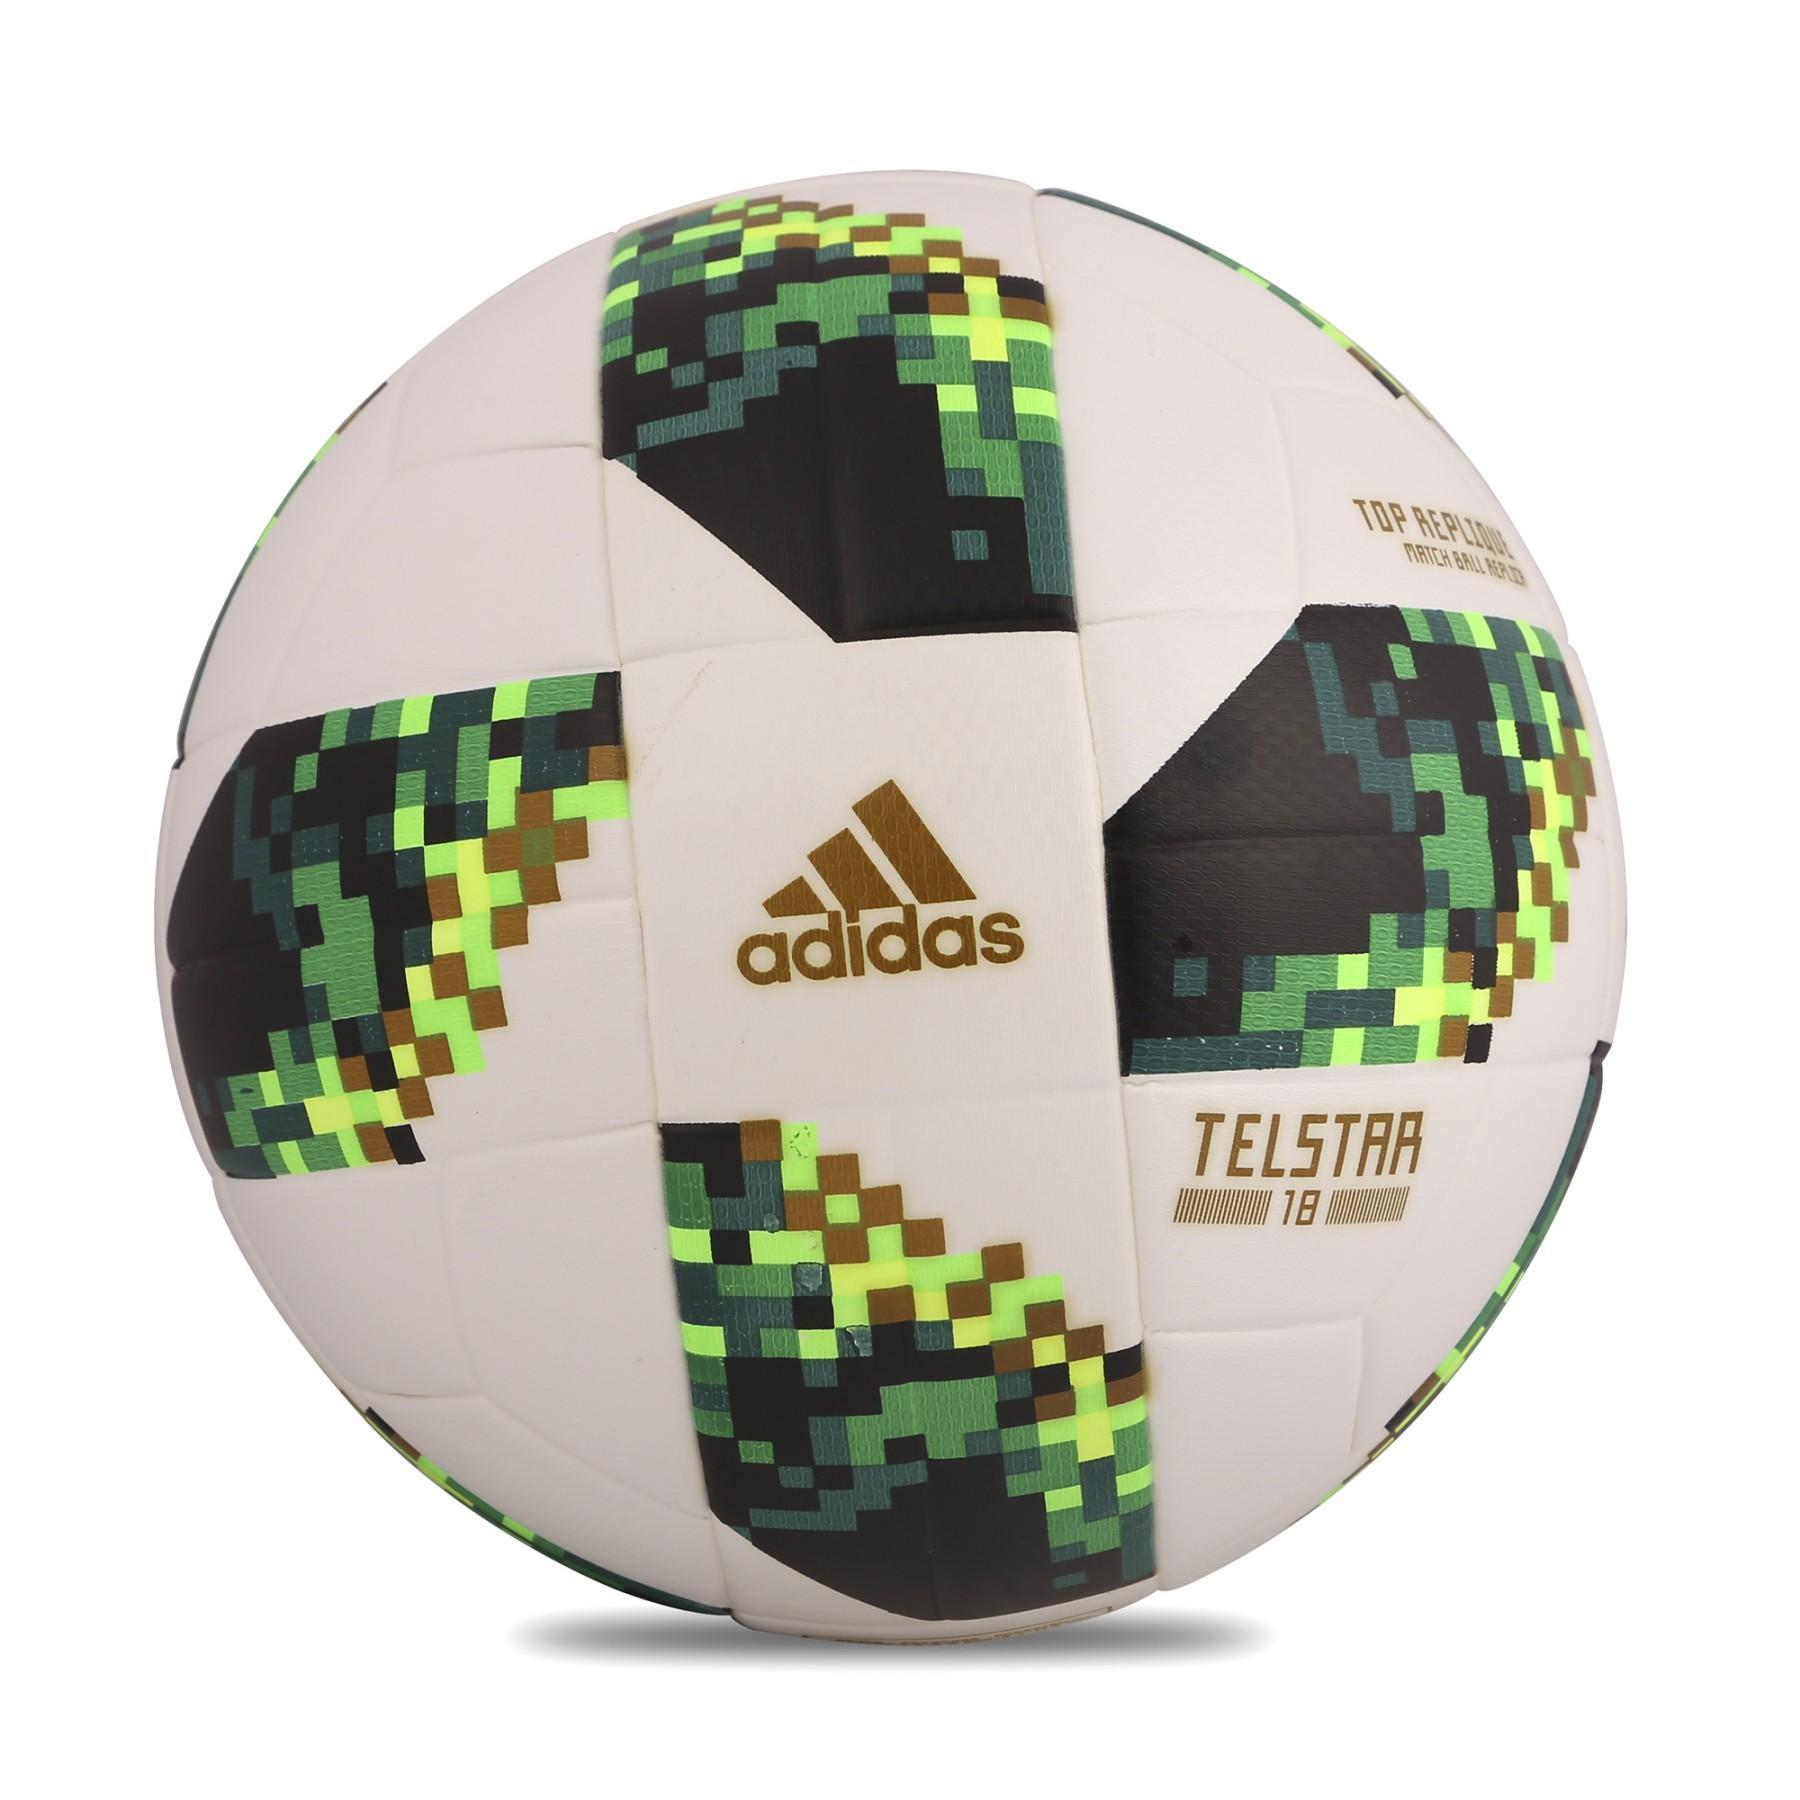 a8d30b9cc Footballs - Buy Footballs at Best Price in Bangladesh